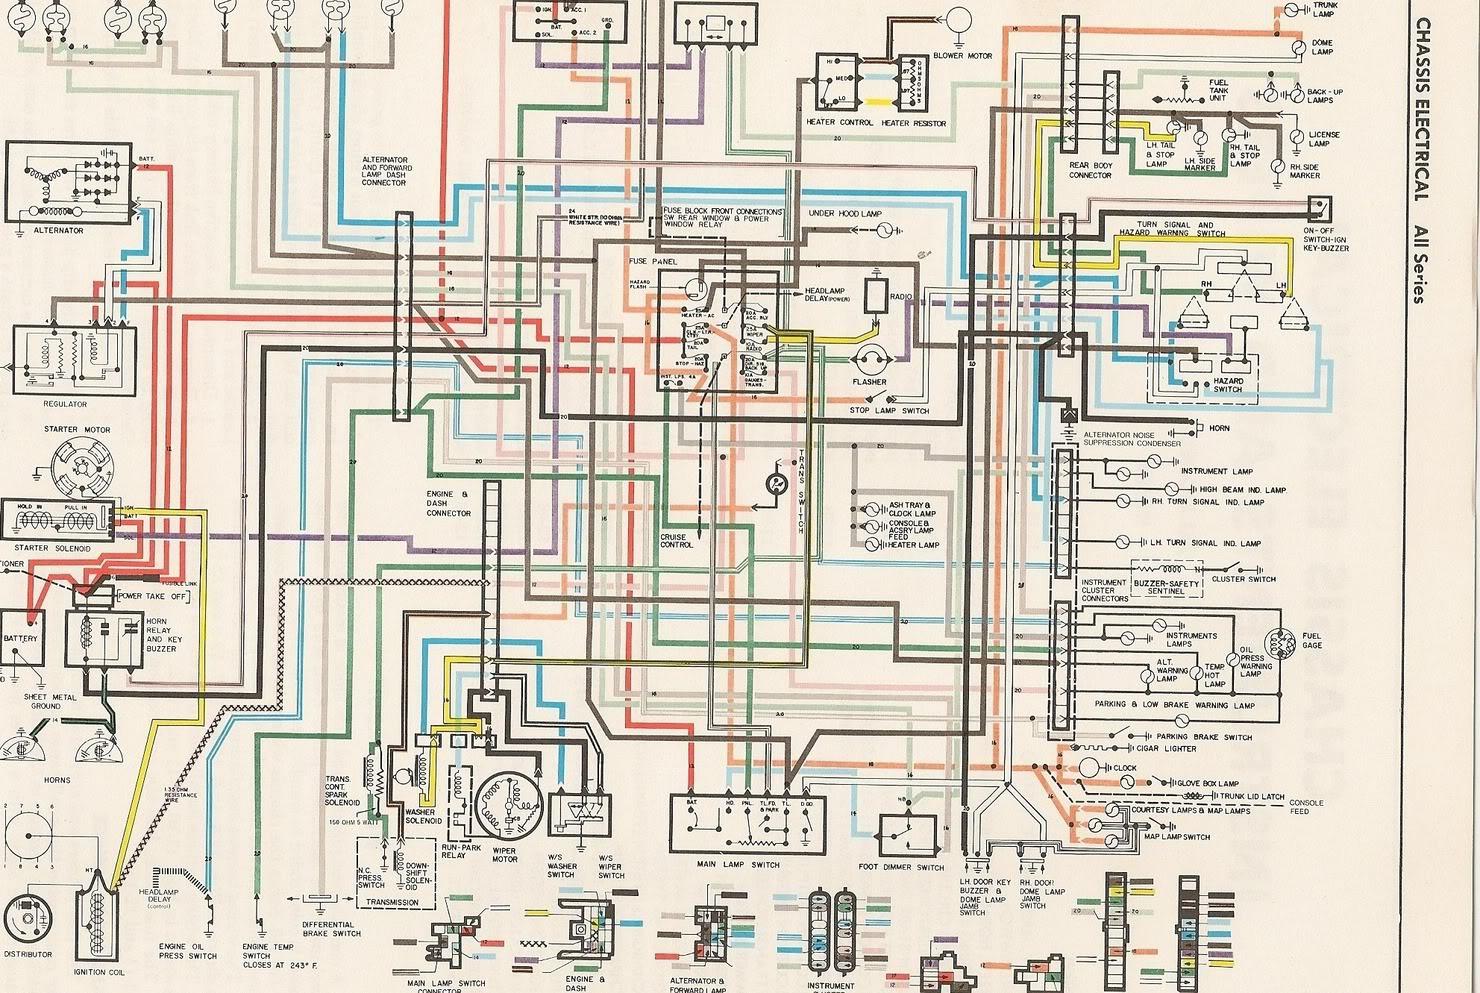 1973 oldsmobile wiring diagram